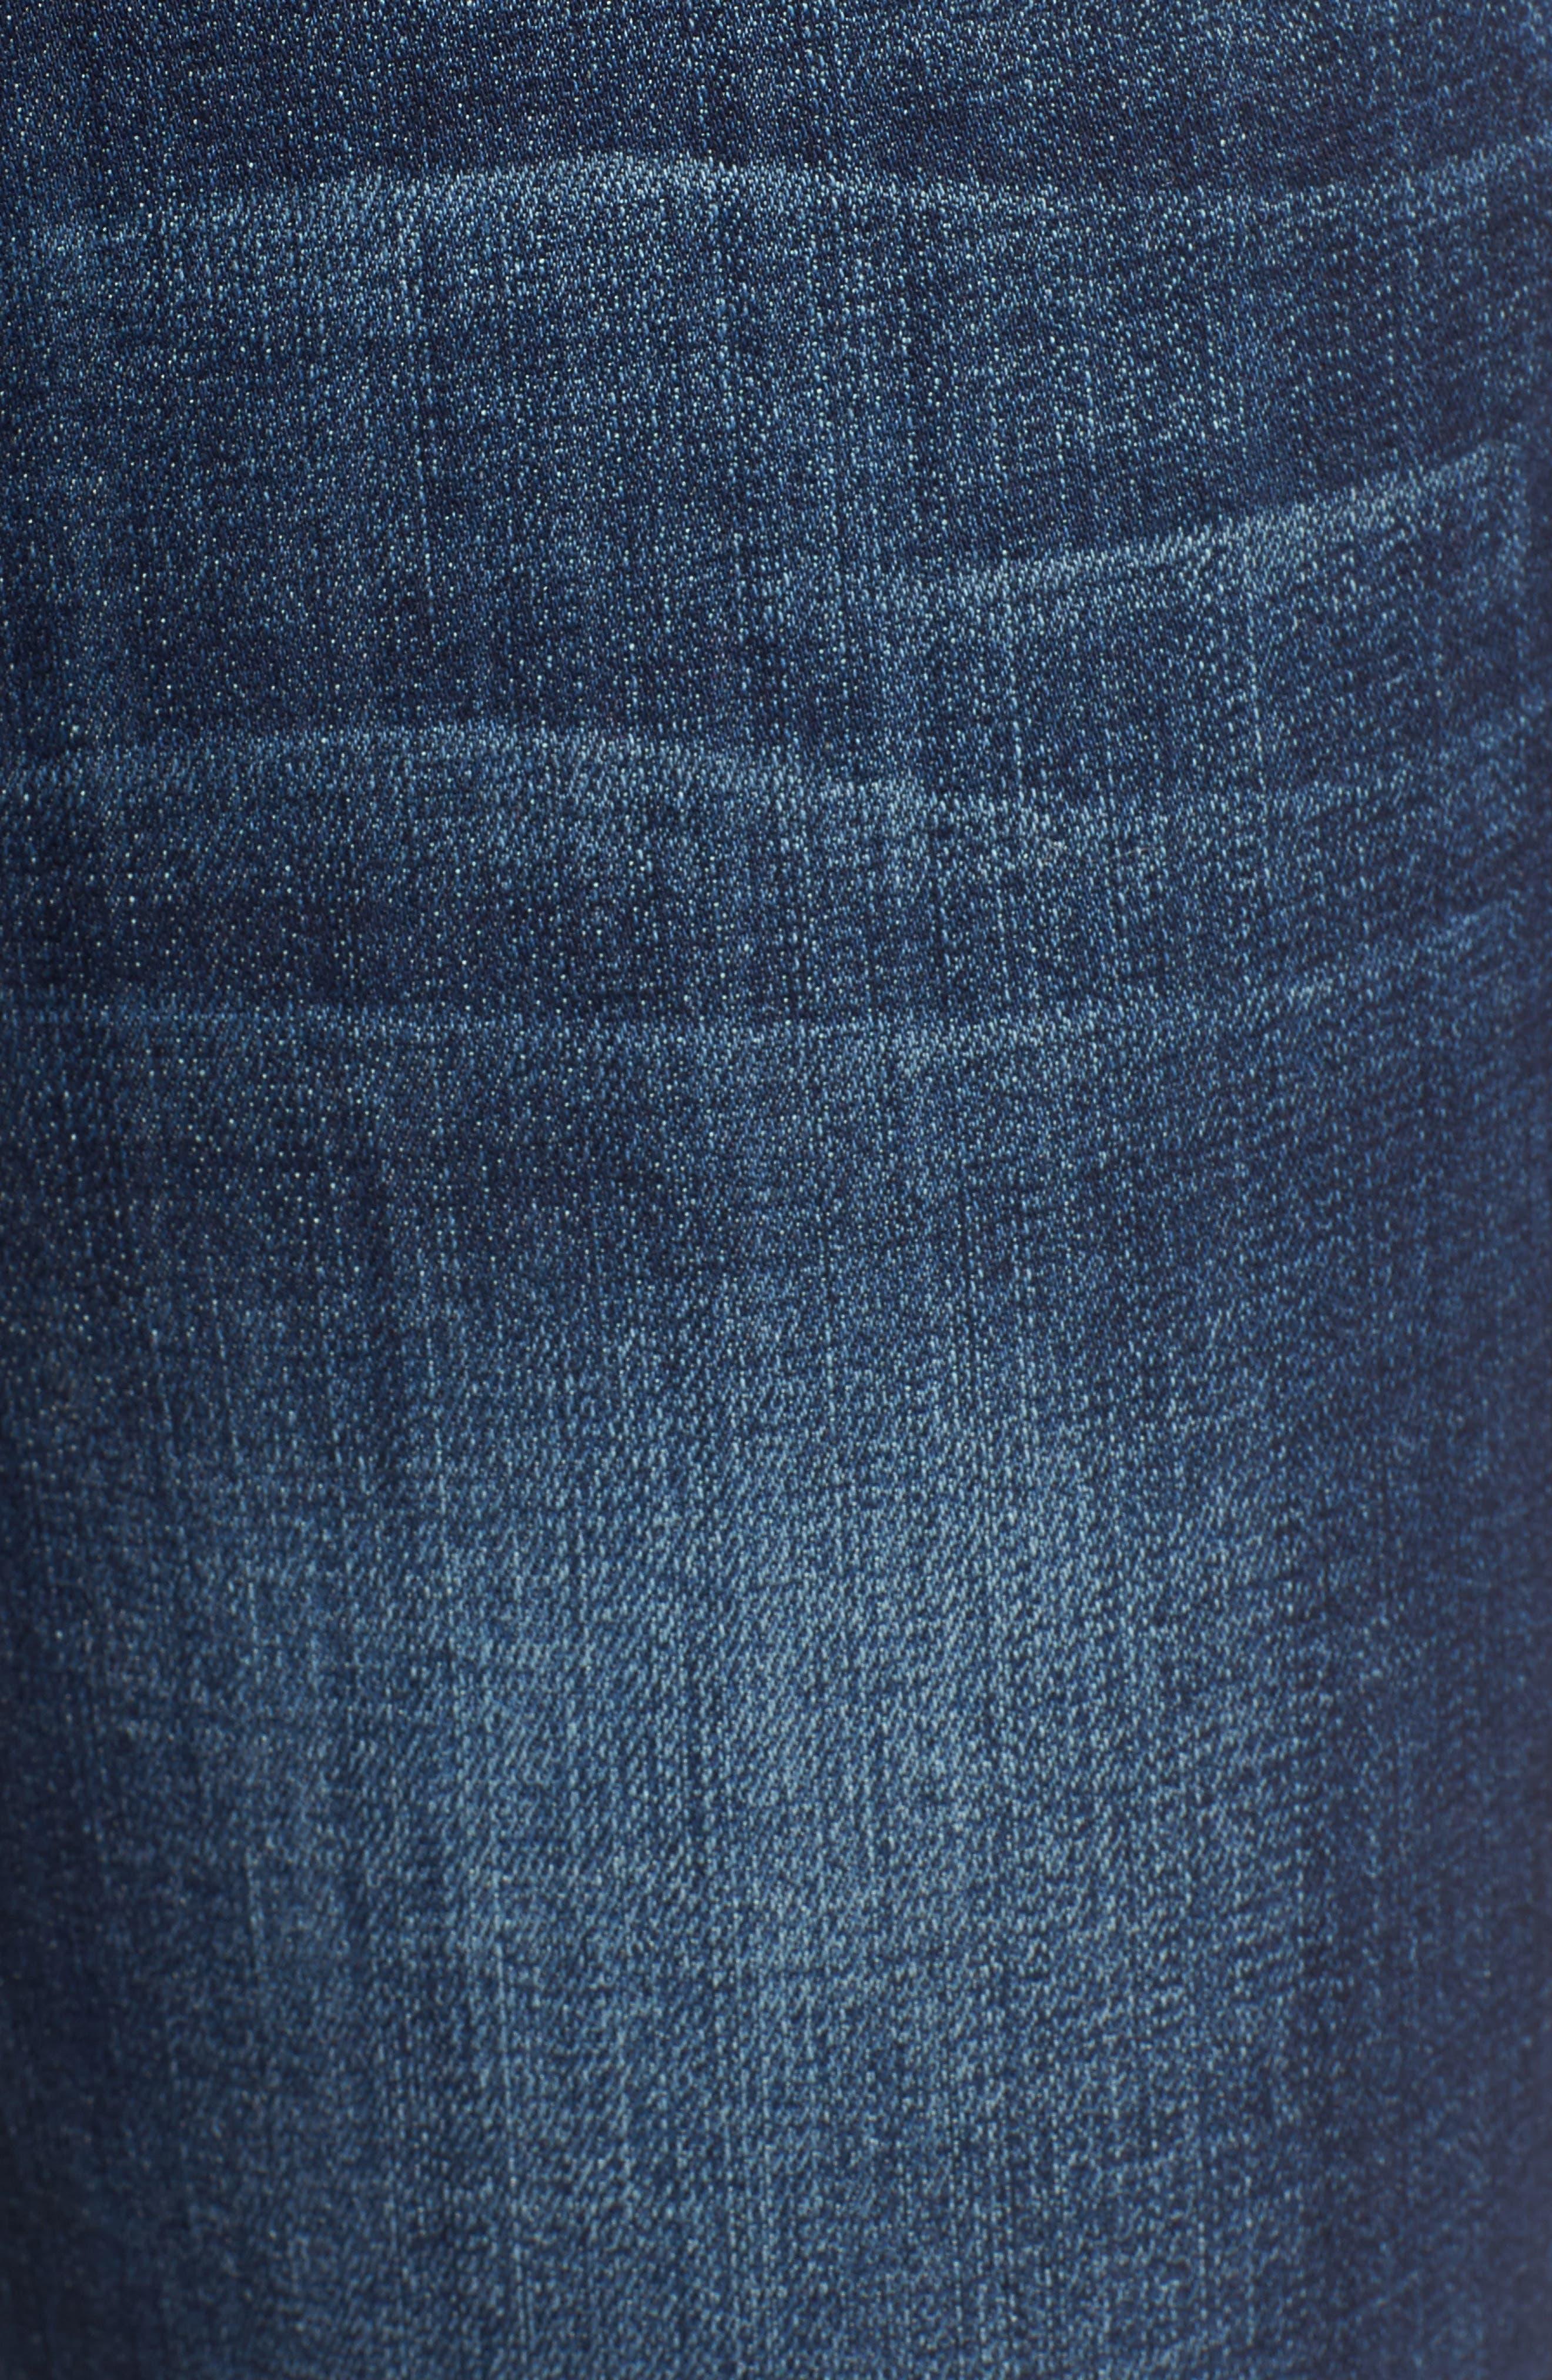 Tuxedo Stripe Skinny Jeans,                             Alternate thumbnail 10, color,